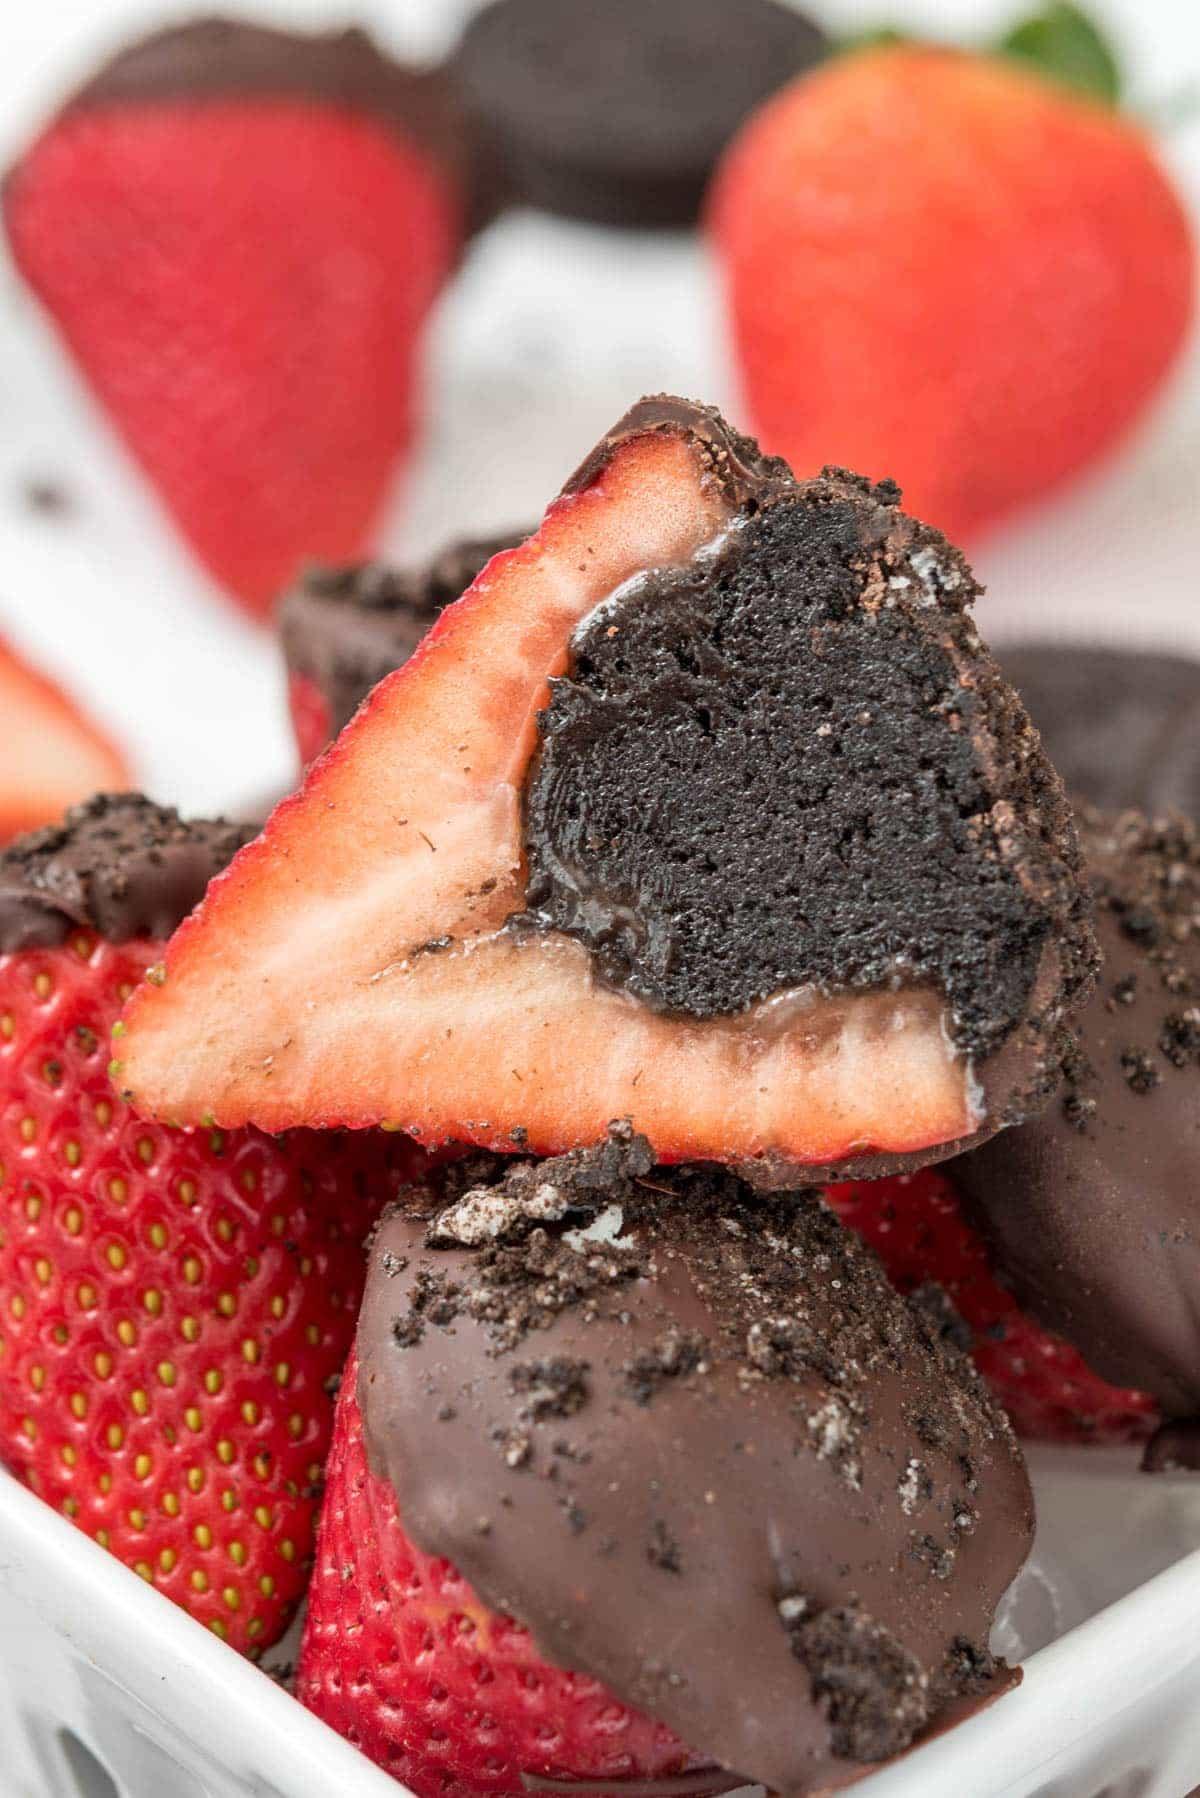 Wedding Chocolate Covered Strawberries